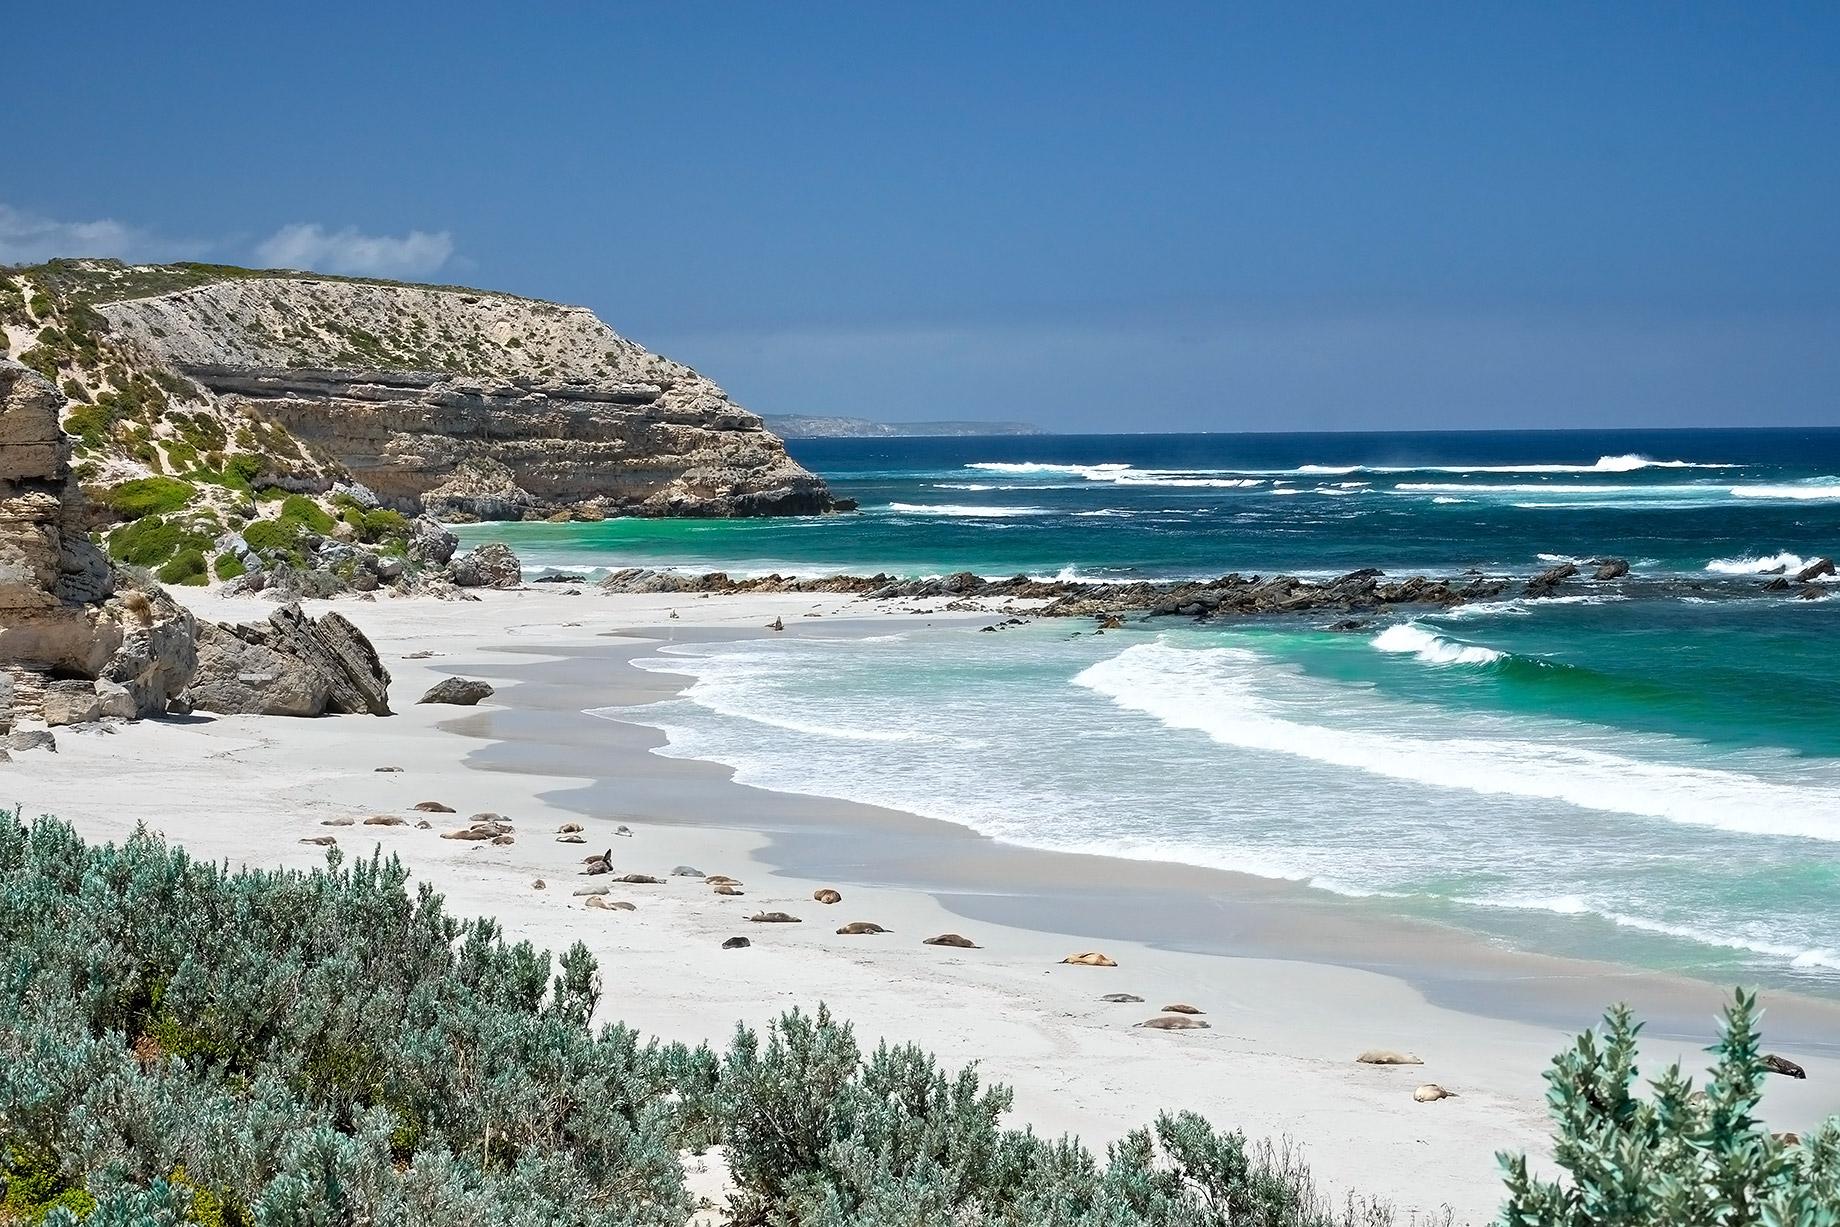 Kangaroo Island - Australia - Top 10 Luxury Travel Destinations Around the World